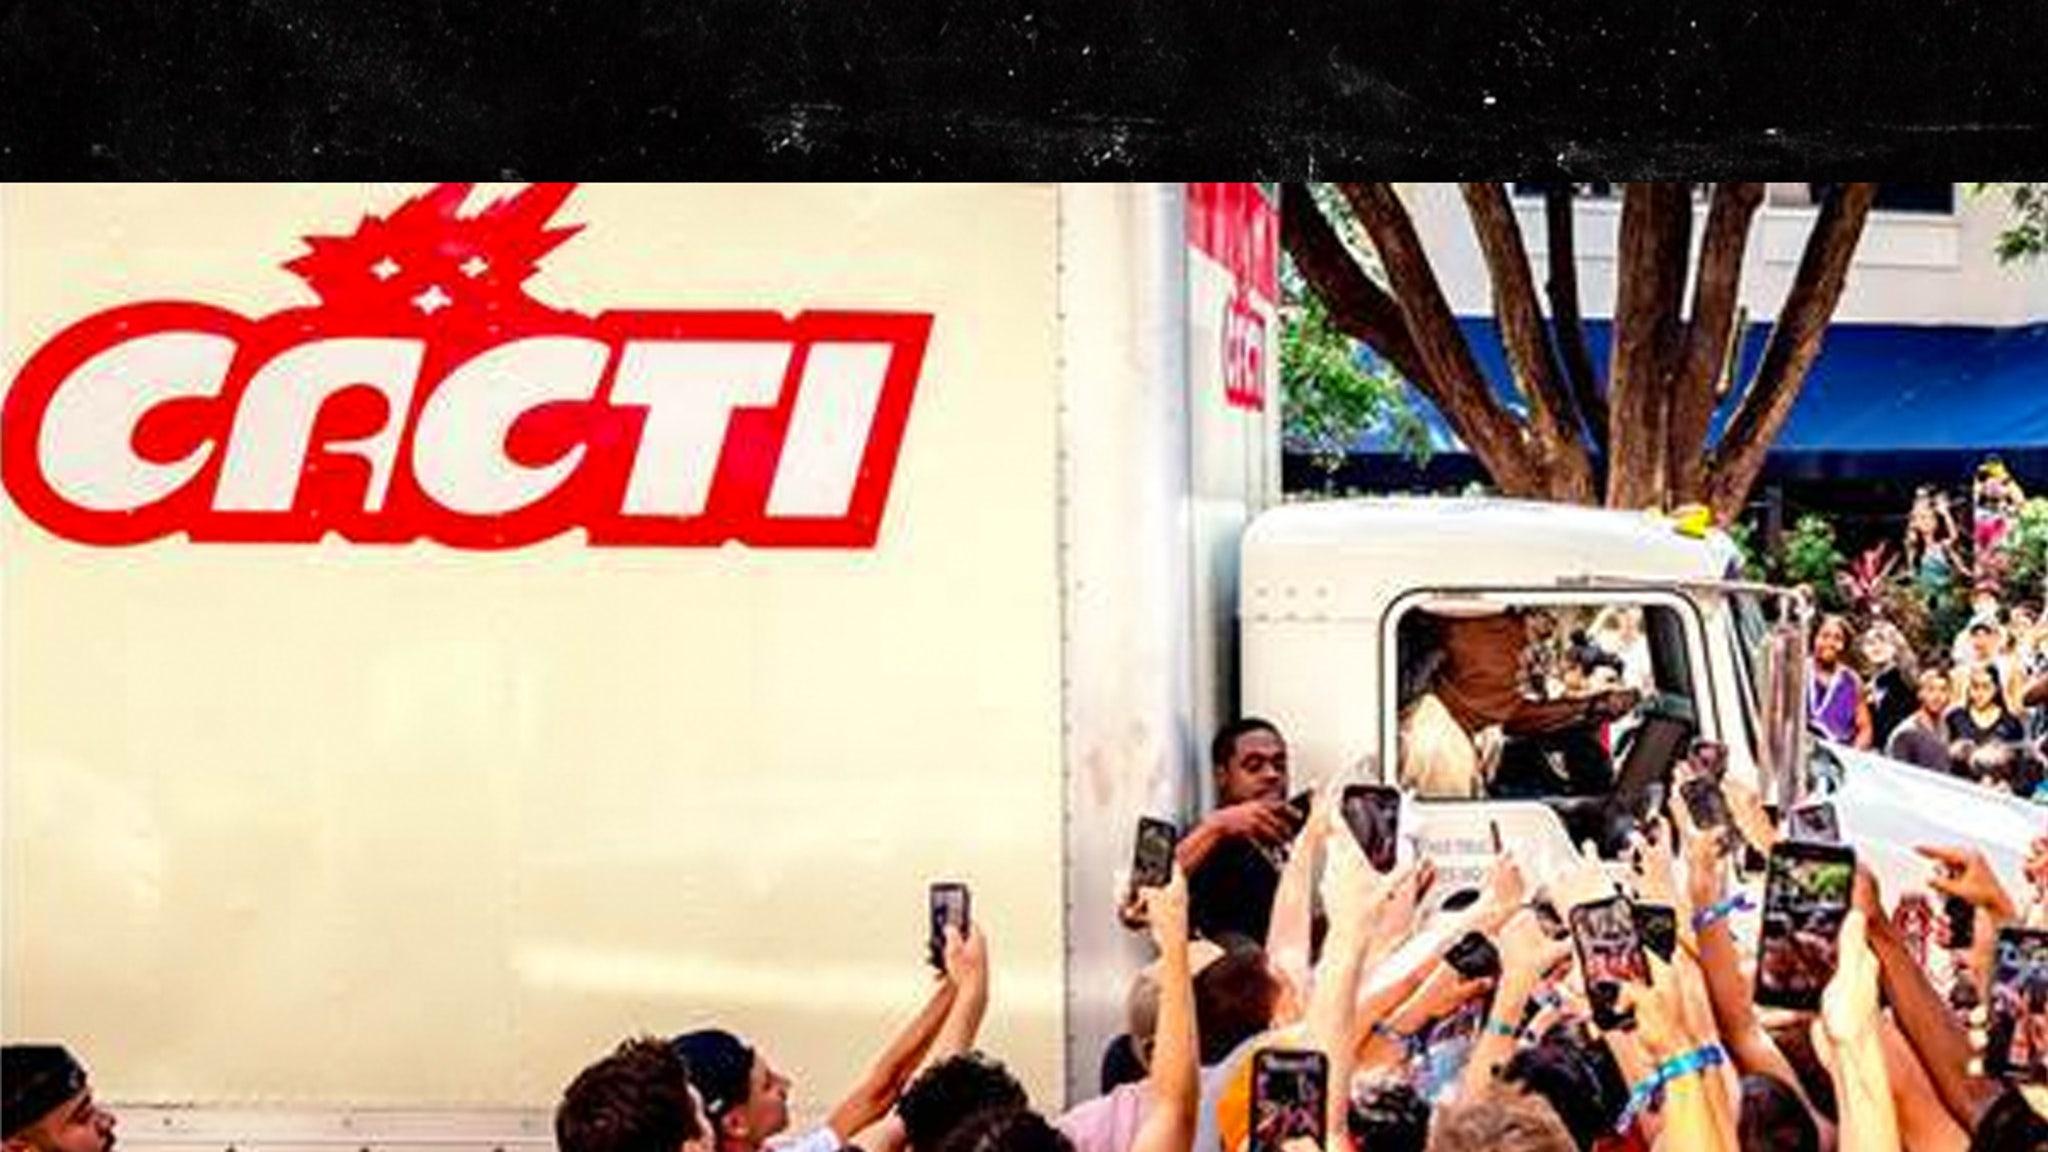 Travis Scott Triggers Crazy Scene in Miami Promoting Spiked Seltzer